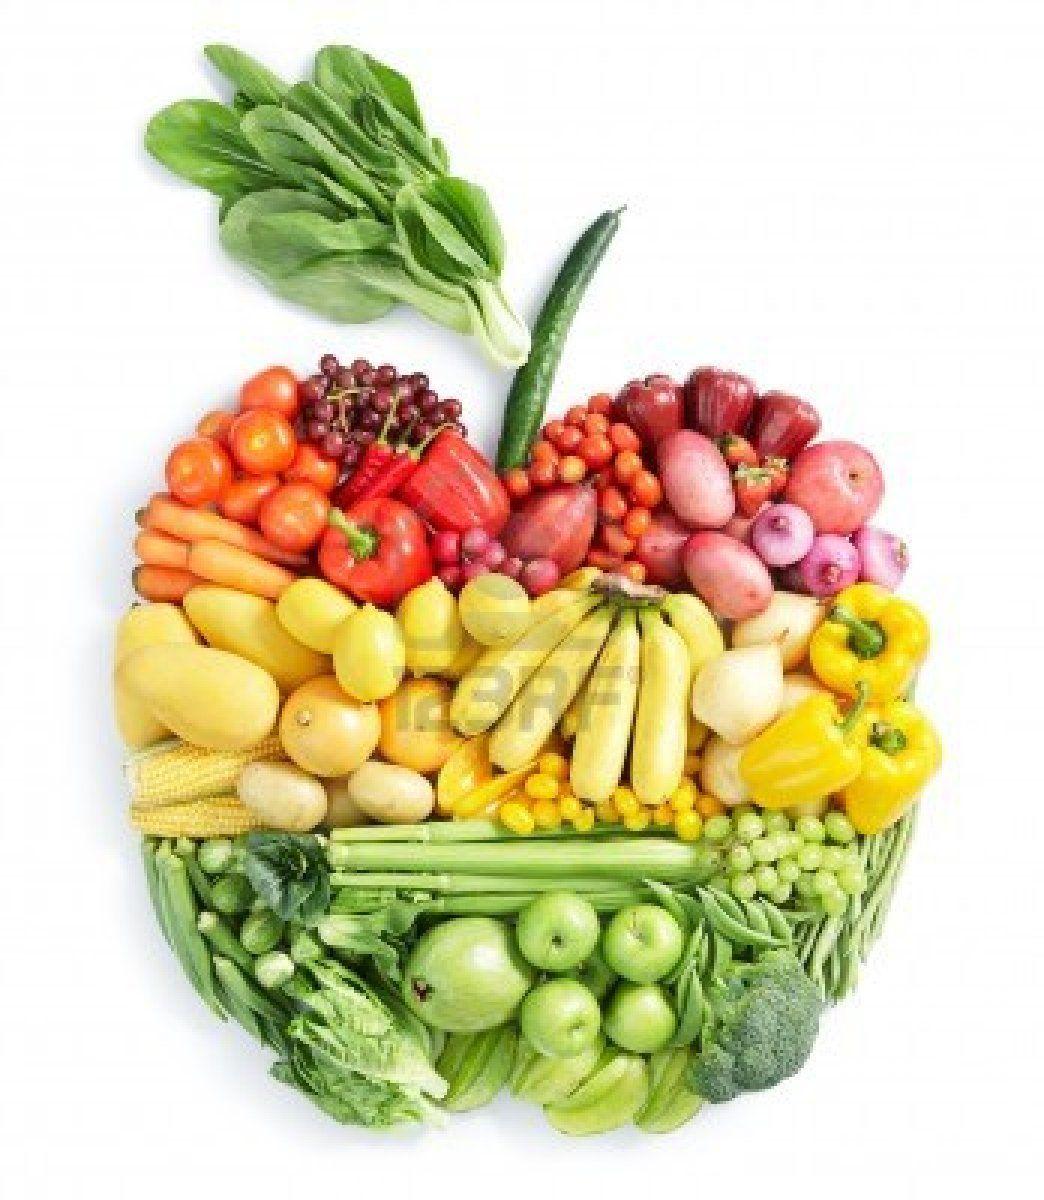 LA COMIDA SALUDABLE: la comida saludable | Salud - Bienestar ...